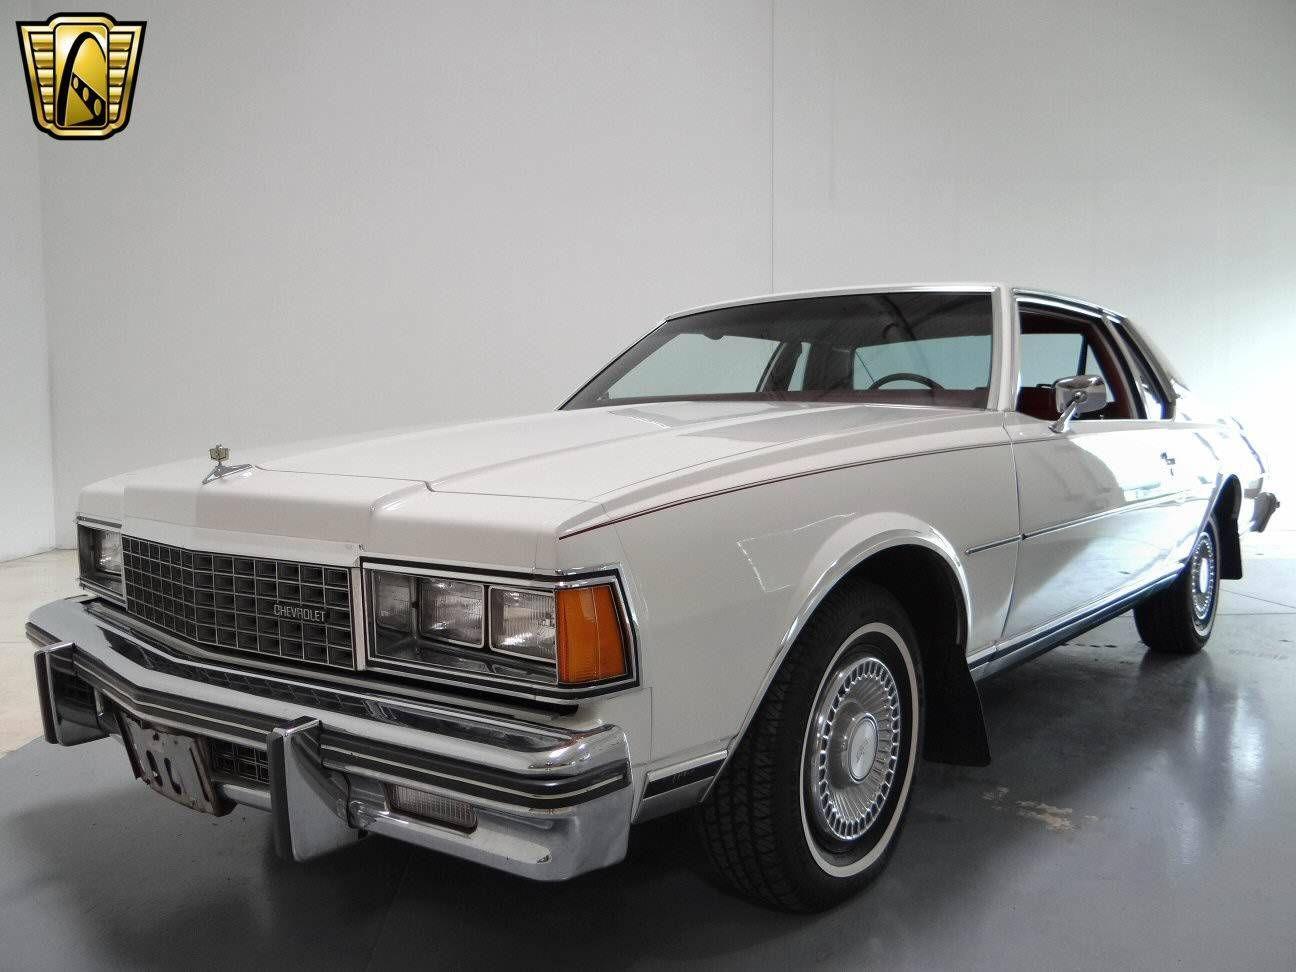 1978 Chevrolet Caprice Coupe Chevrolet caprice